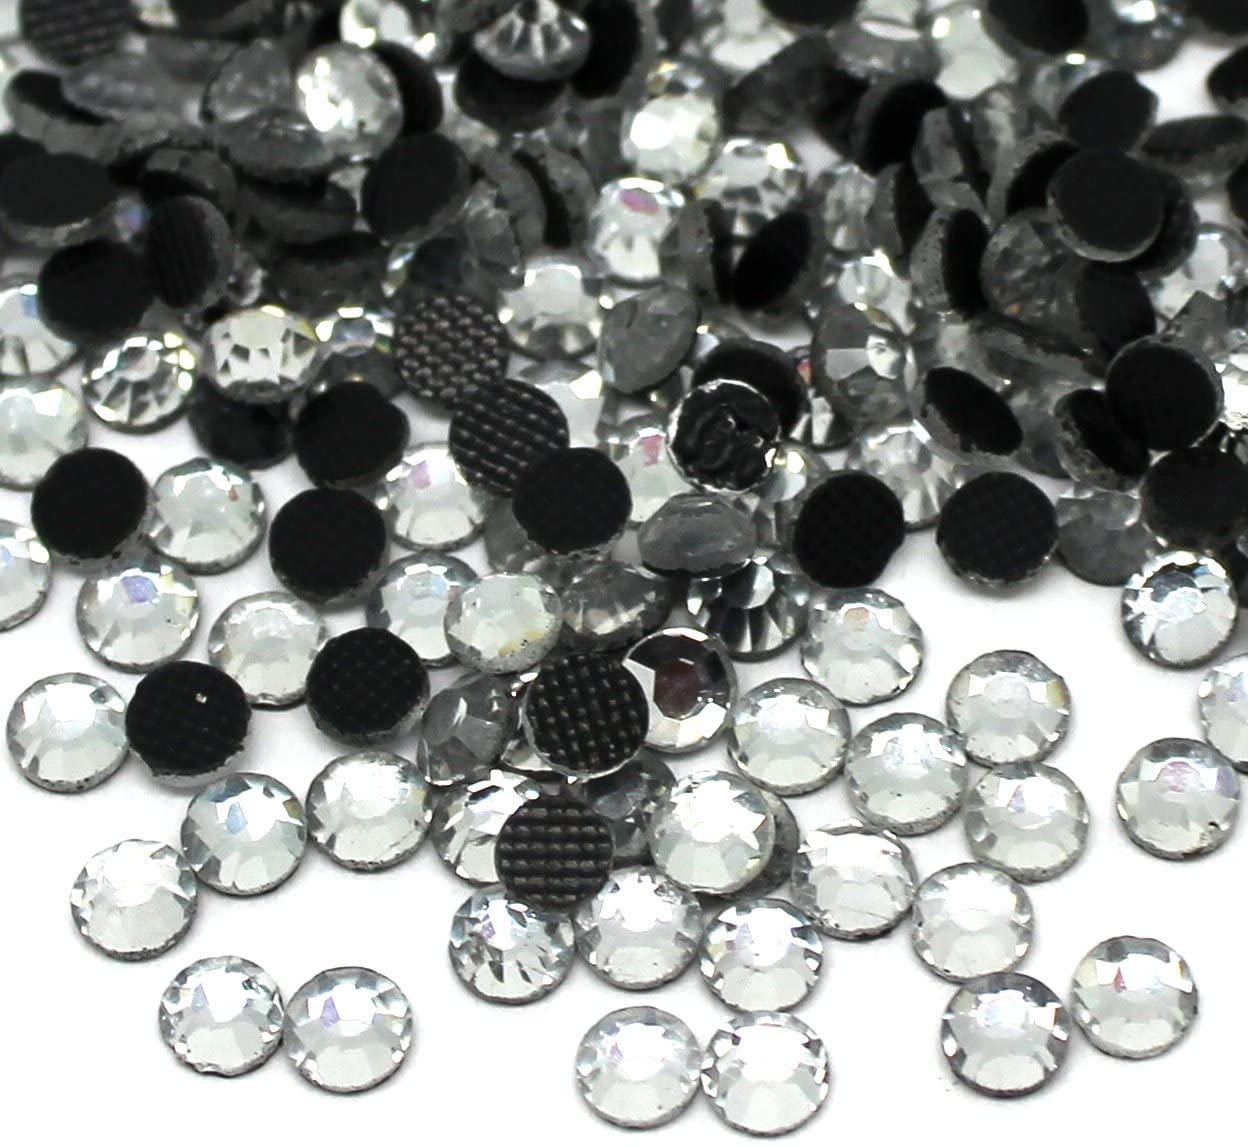 Zbella Crystal Hot Fix Rhinestones 10 Gross (1440 Stones/pkg) Hotfix Rhinestones (ss20, Crystal)